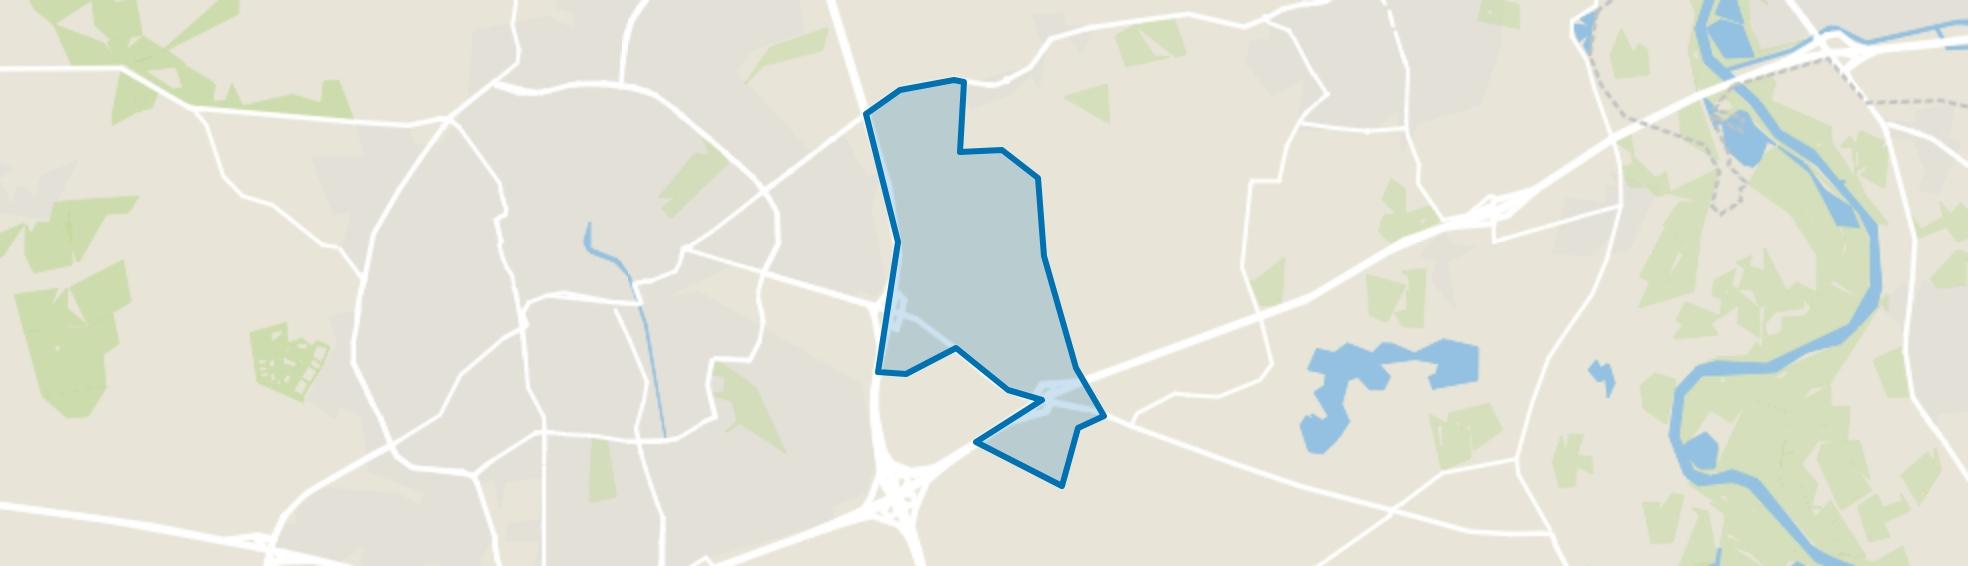 Wolthuis, Apeldoorn map